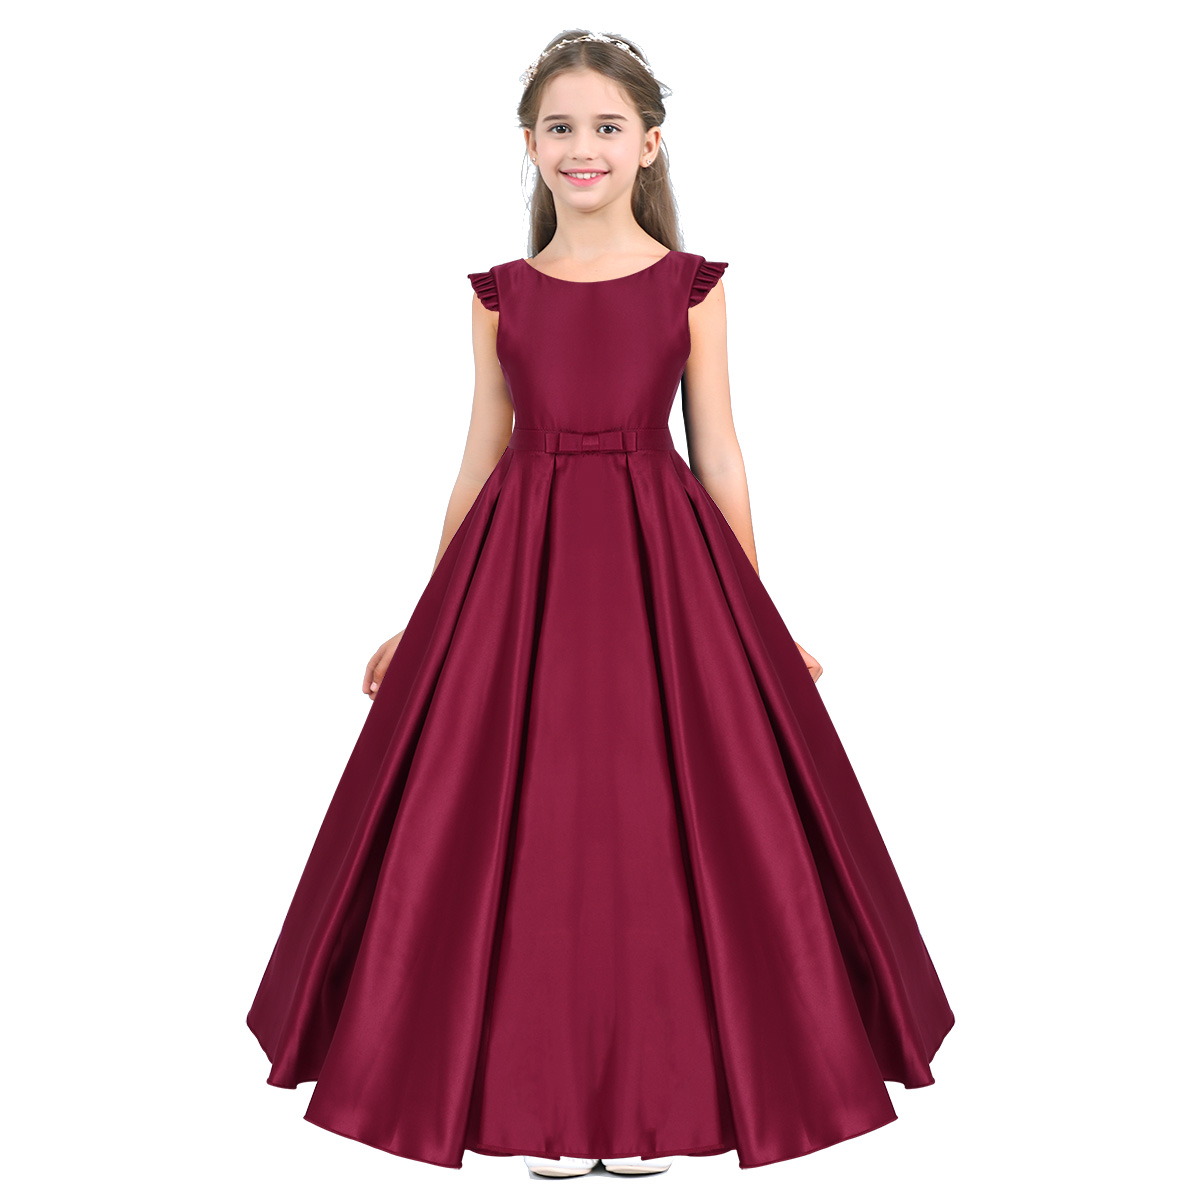 d9f0e92230693 kız çocuk abiye elbise ,bebek elbise,kız çocuk elbise,kız çocuk elbise  modelleri